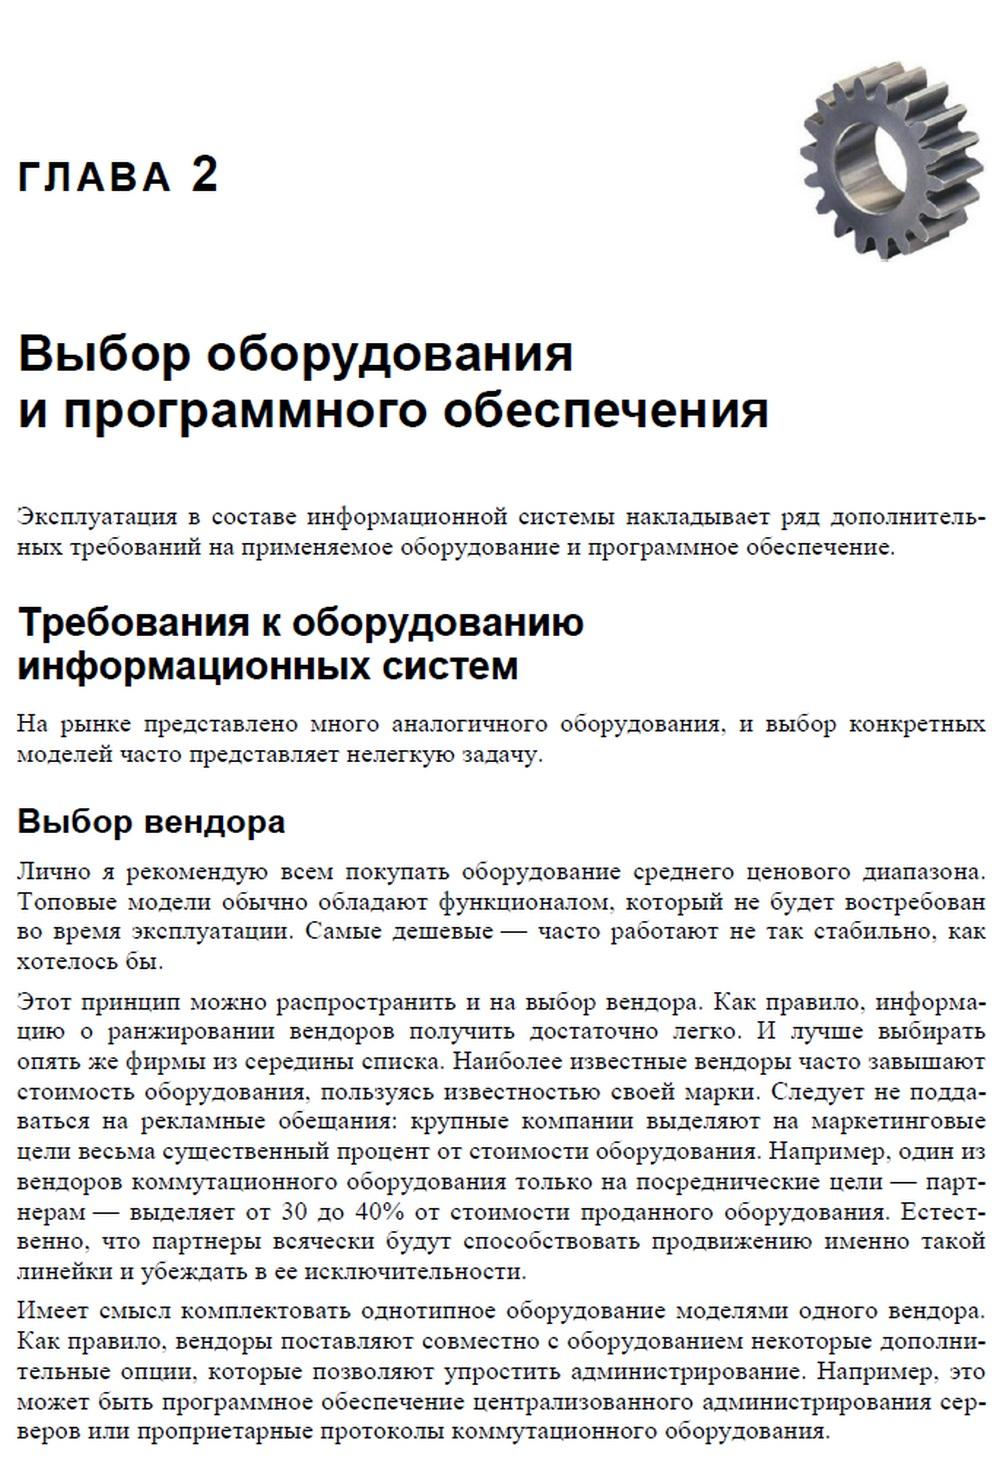 http://i5.imageban.ru/out/2013/11/20/411377ef214b89515df676c34062cde4.jpg